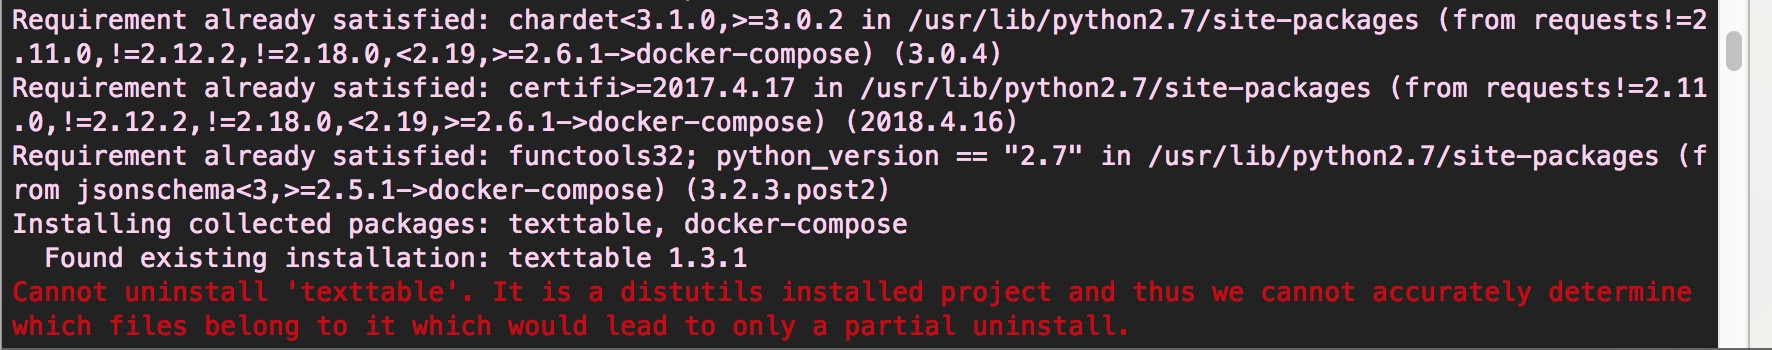 删除distutils installed的内容,顺畅安装docker-compose